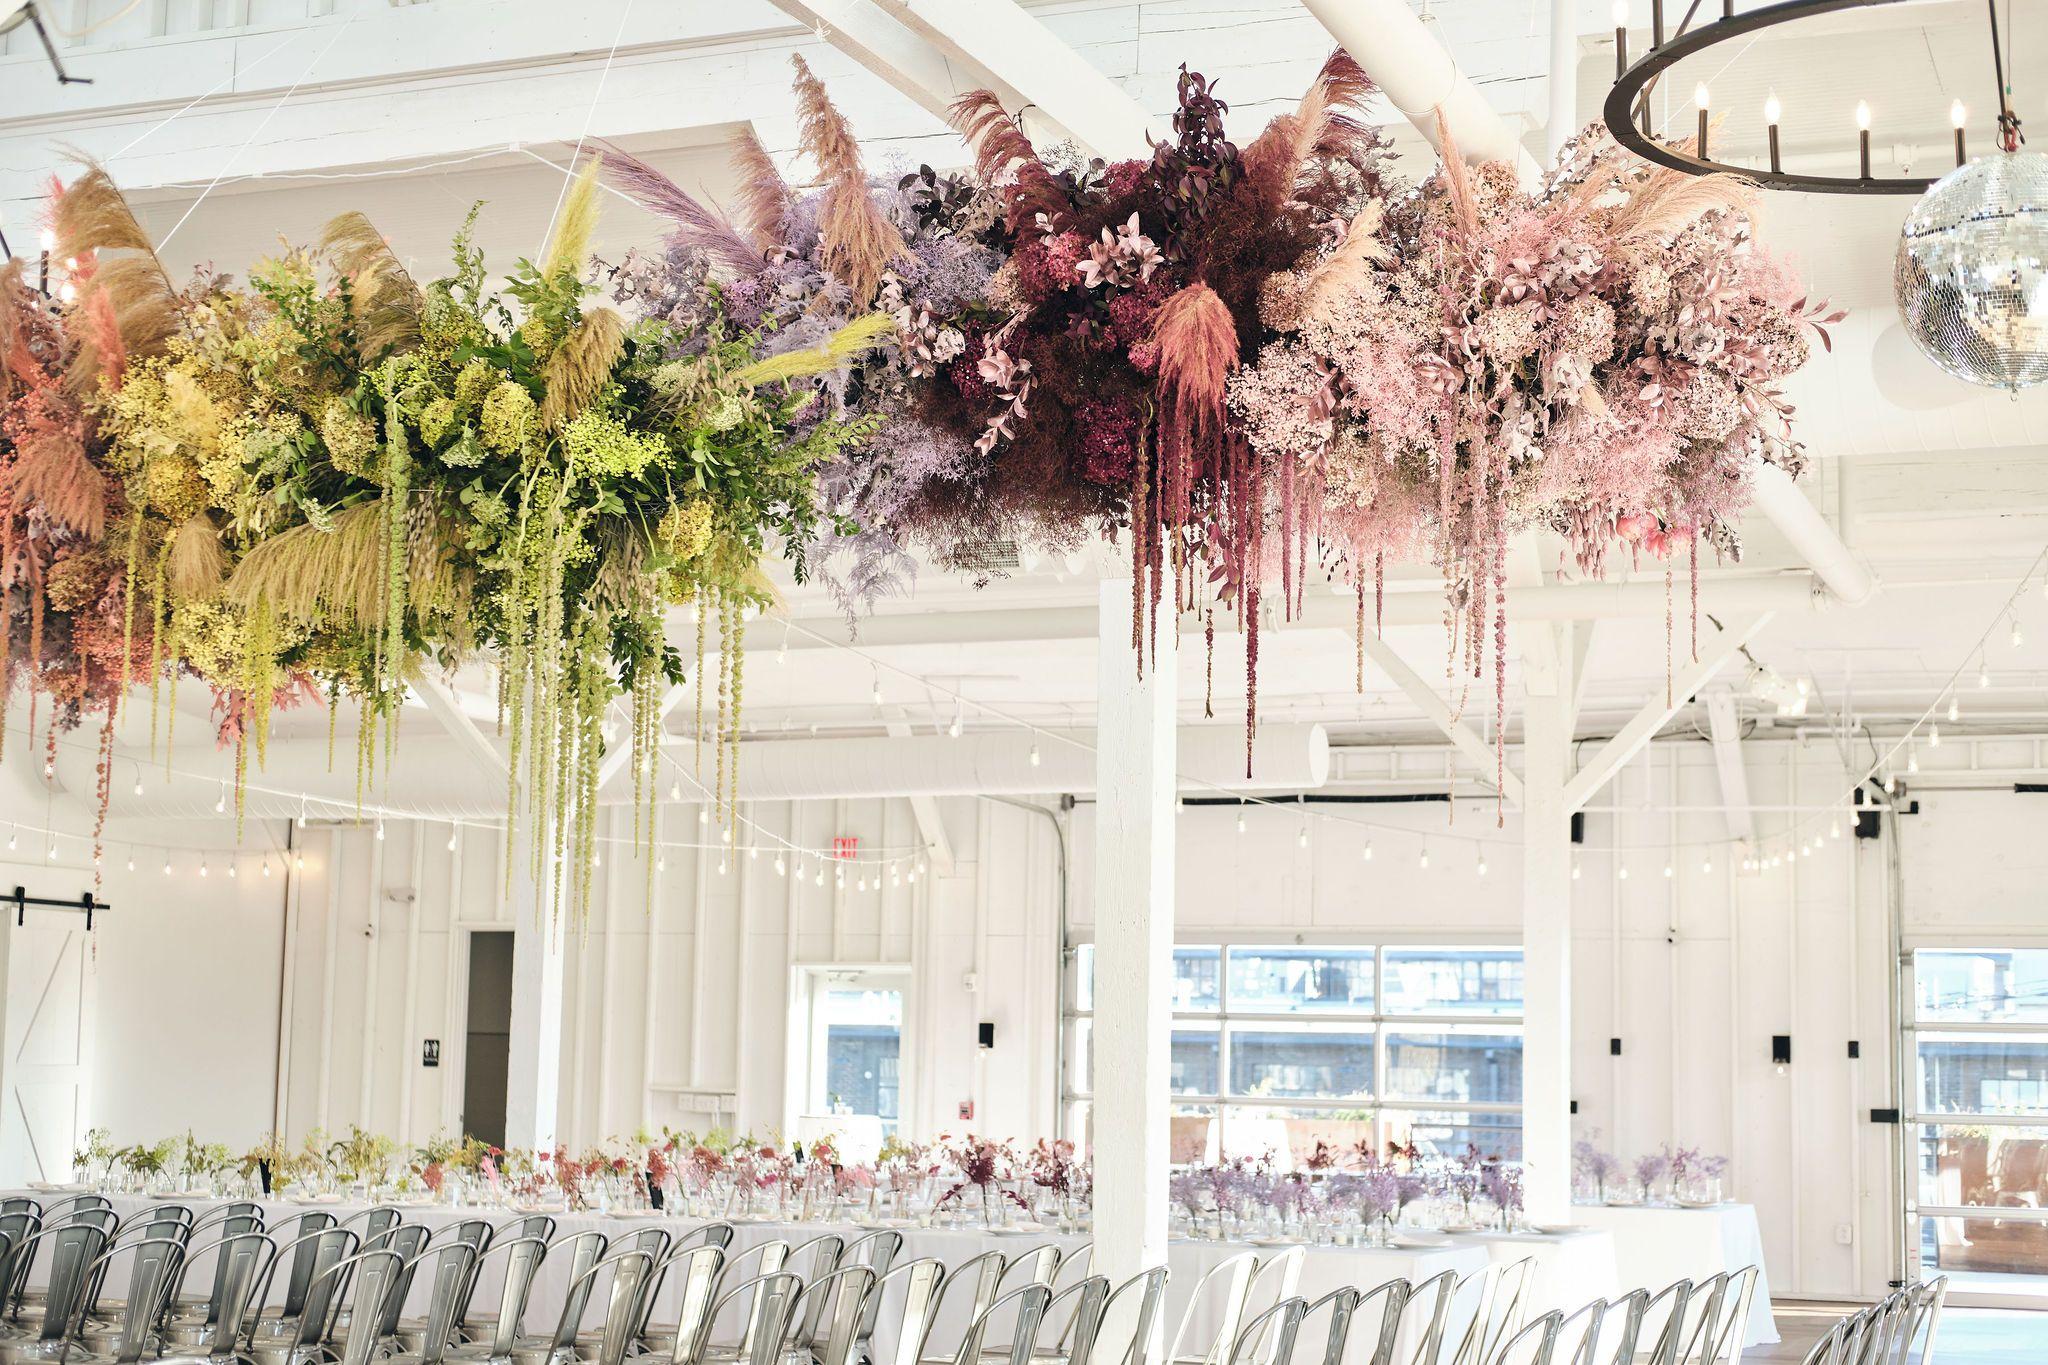 Rainbow Floral Installation Wedding Ceiling Decorations Hanging Wedding Decorations Hanging Flower Arrangements